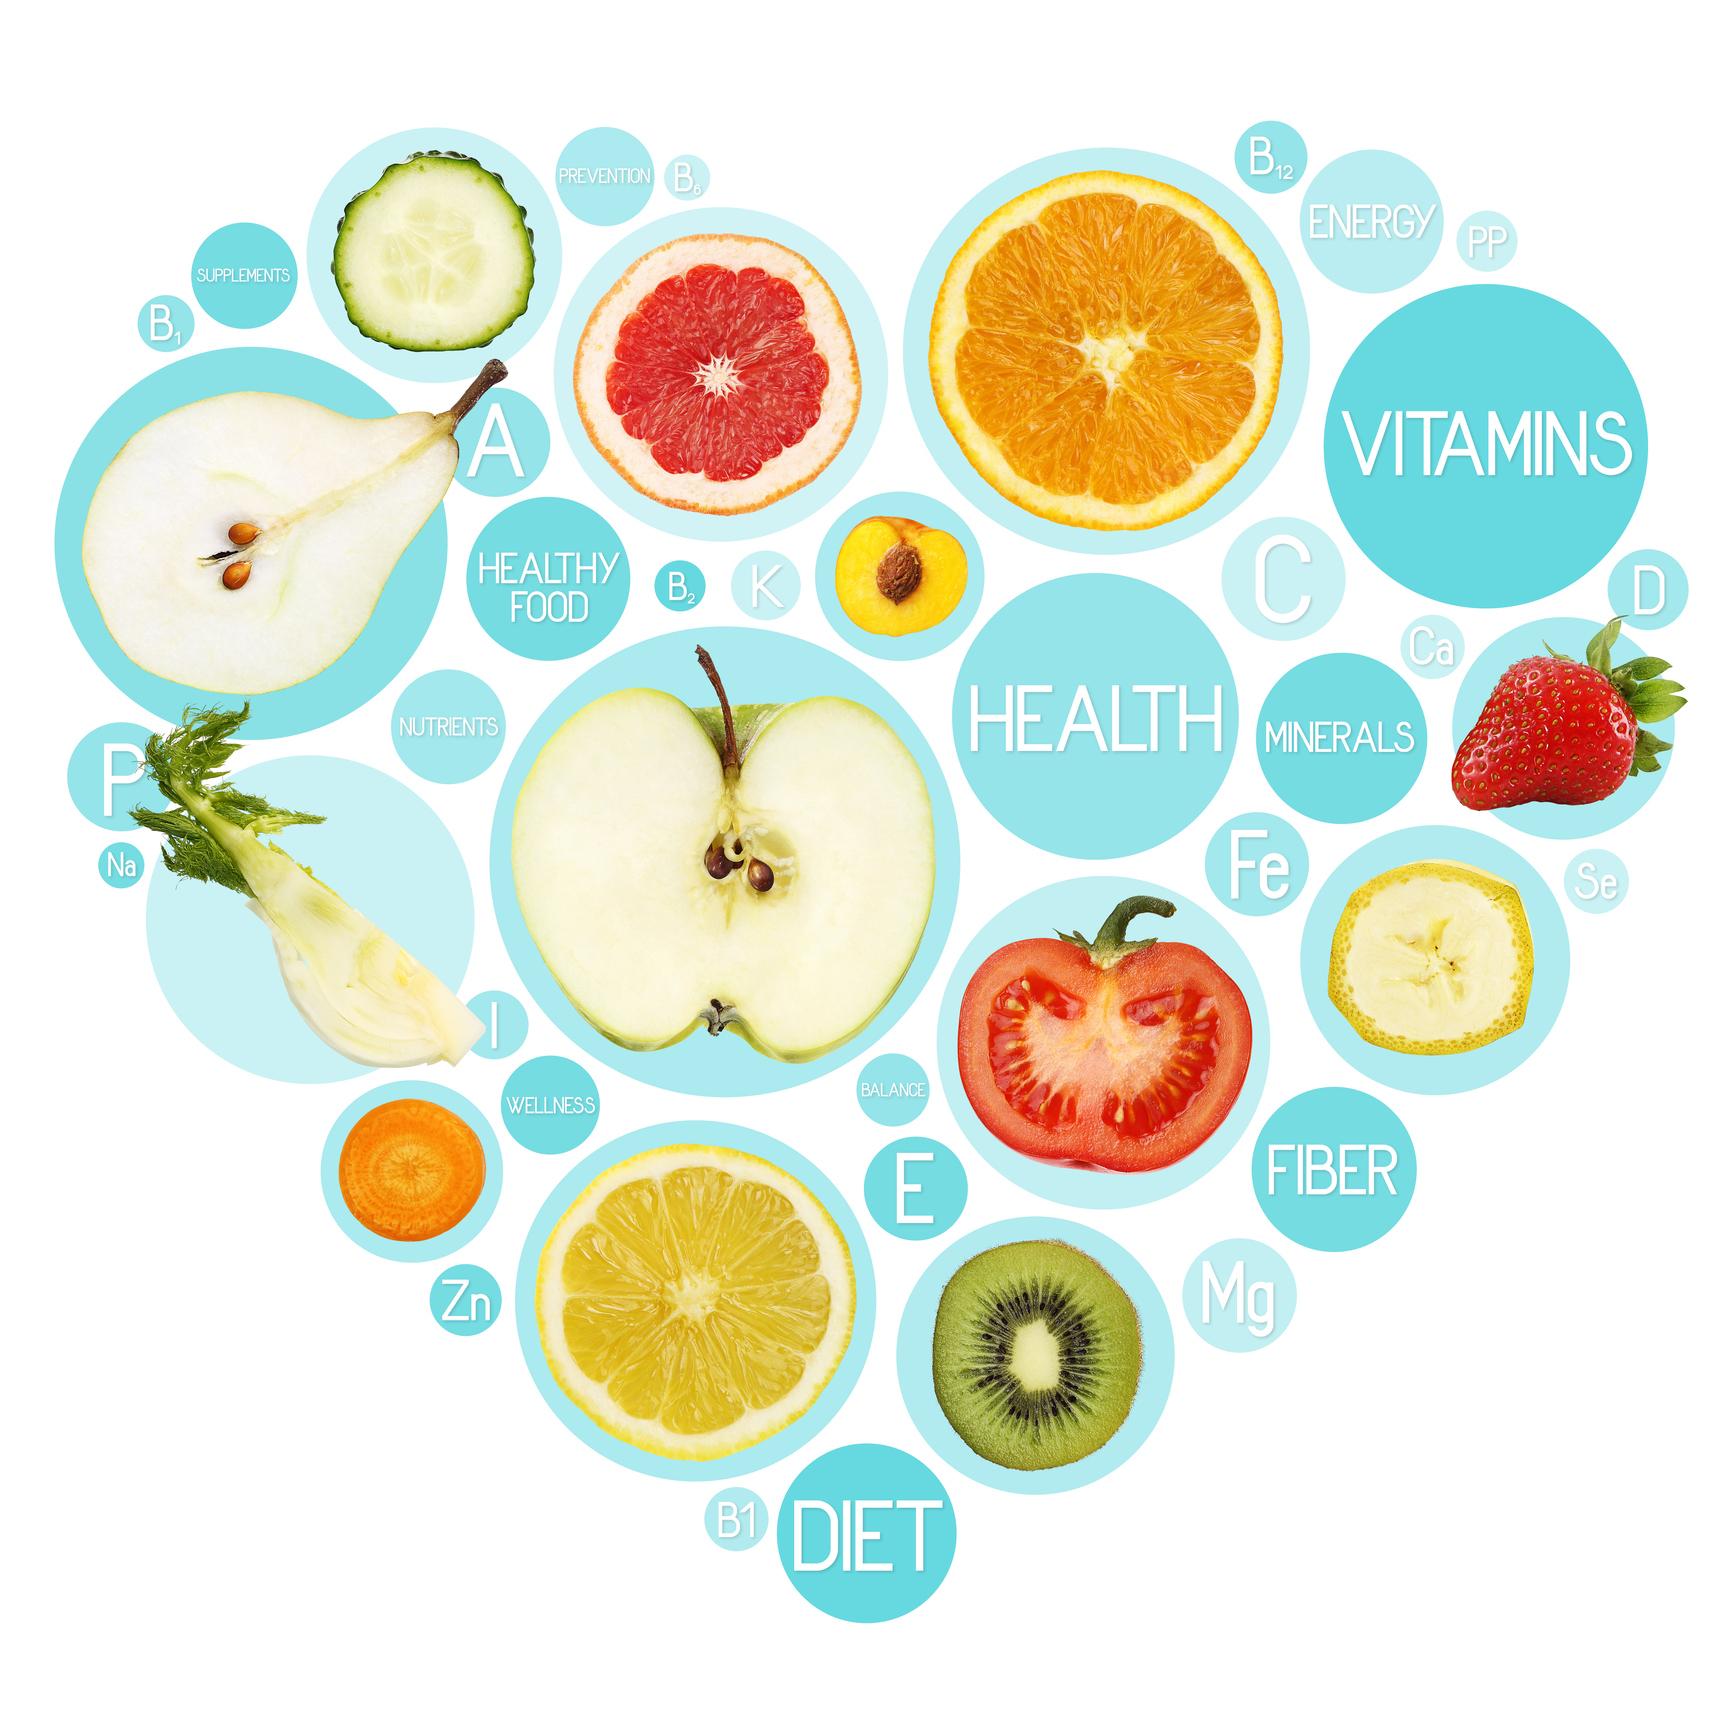 Fruit symbols in hearth shape, diet concept